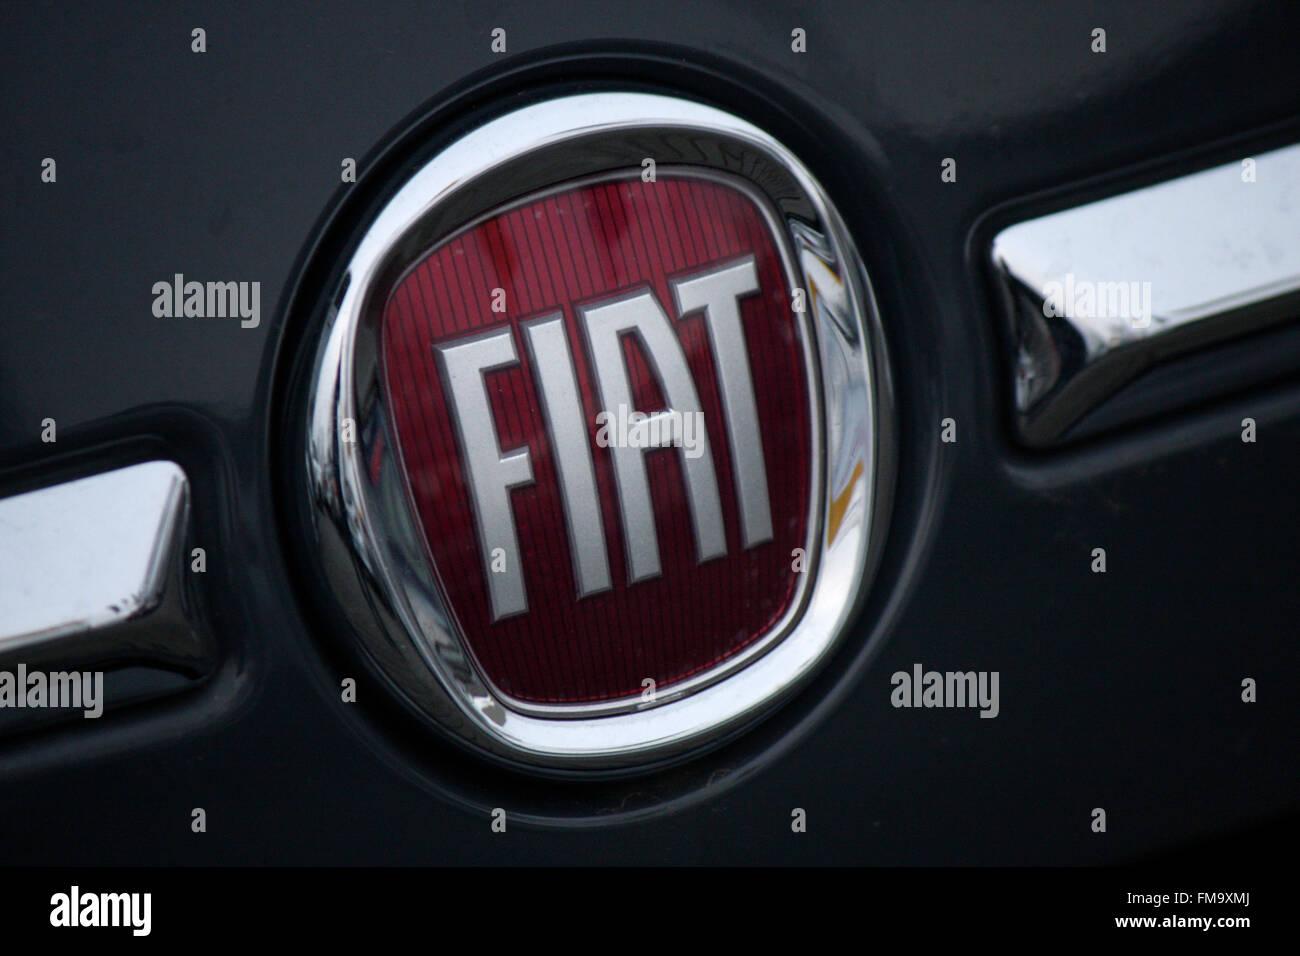 Markenname: 'Fiat', Berlin. - Stock Image